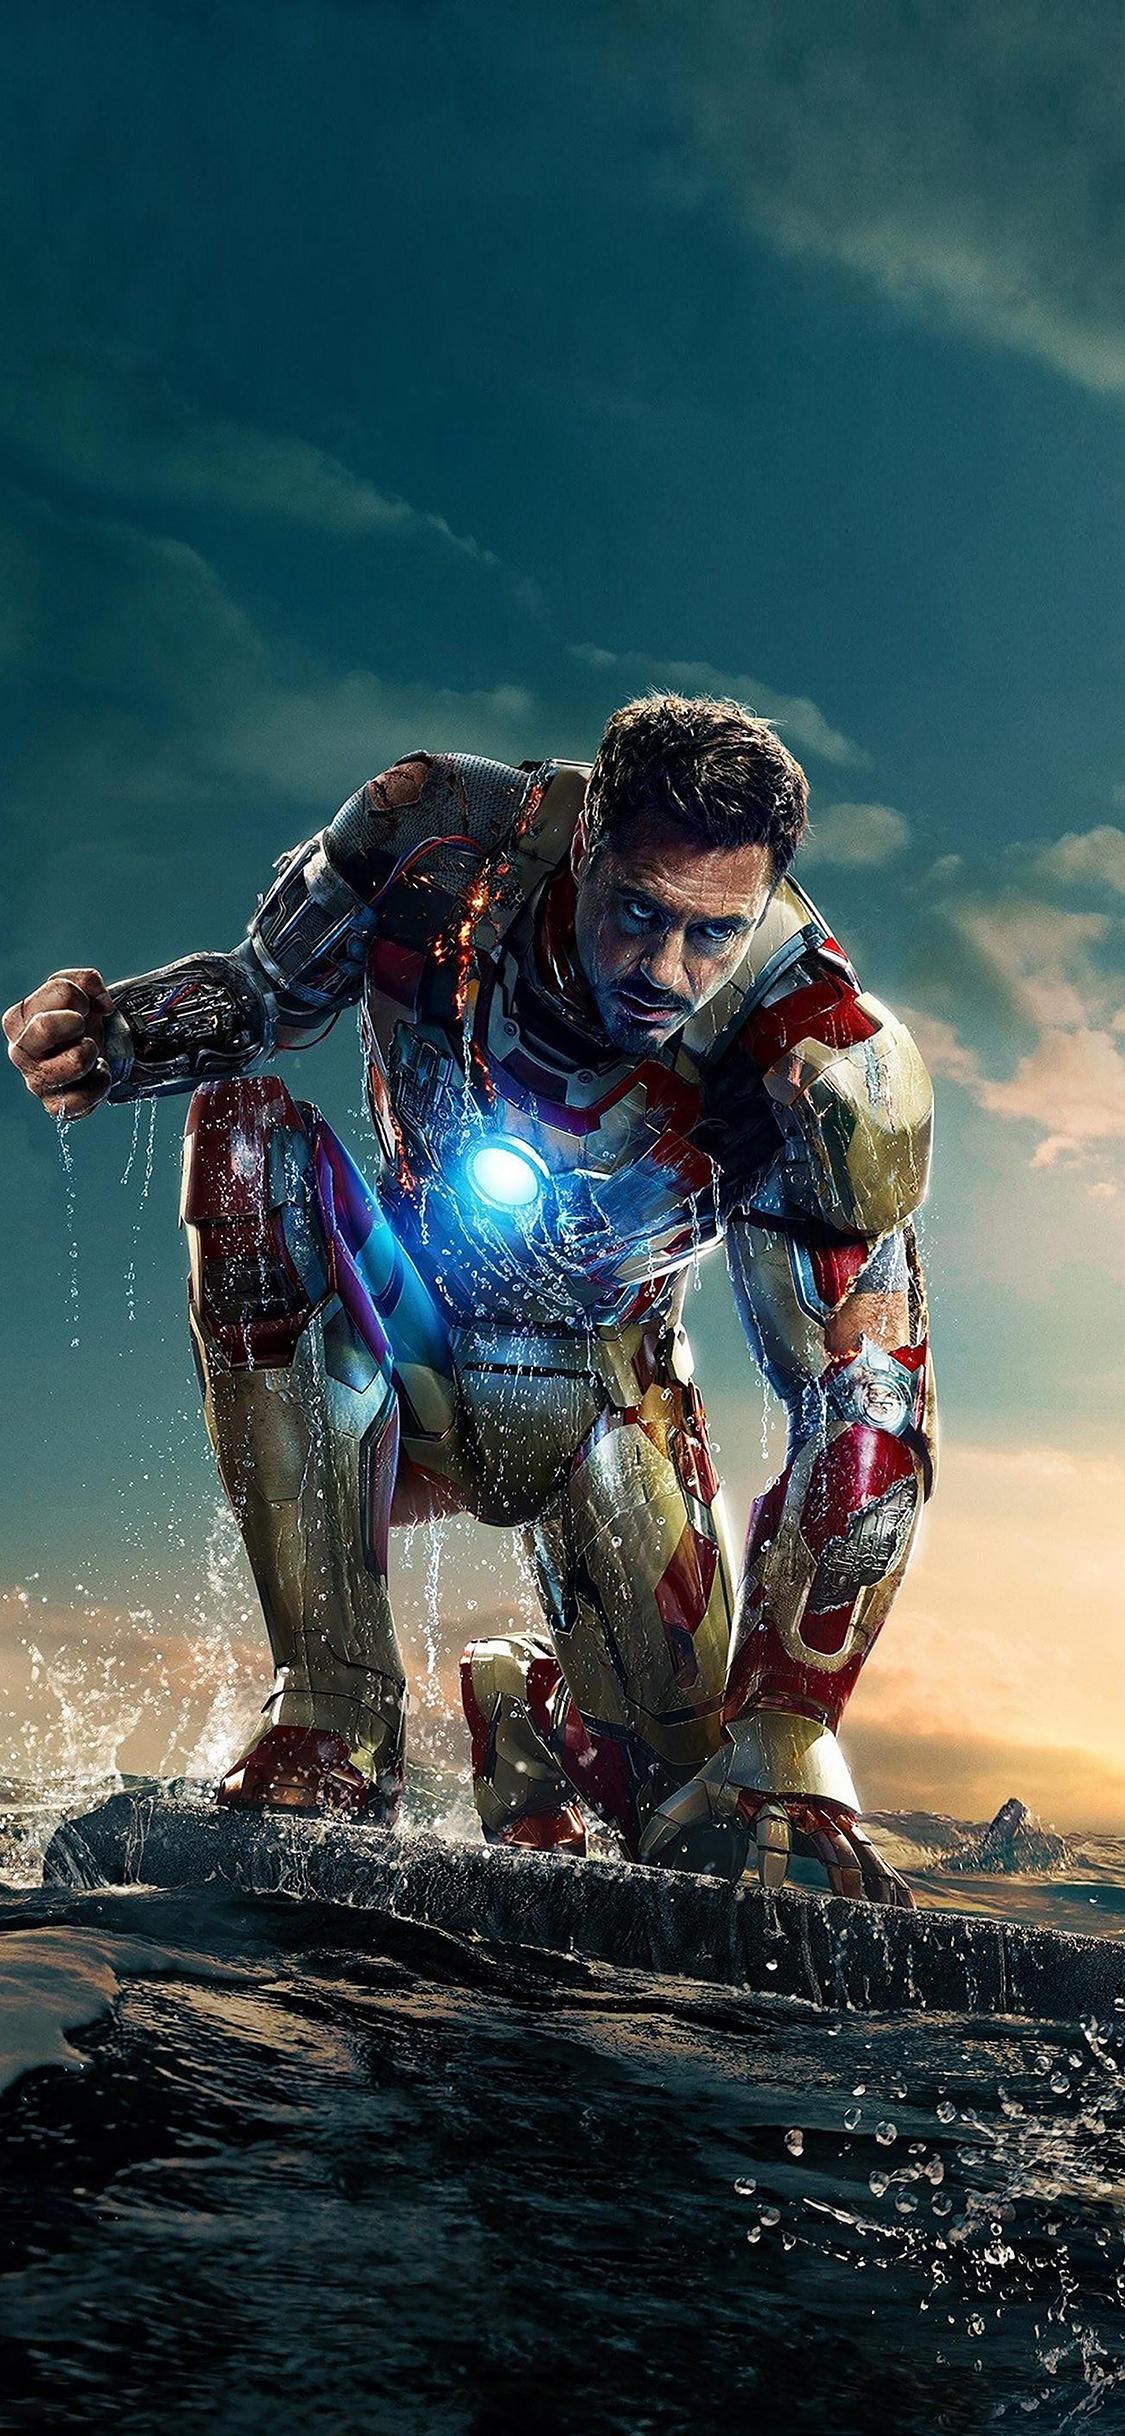 Iphonexpapers Com Iphone X Wallpaper Ae66 Ironman In Hero